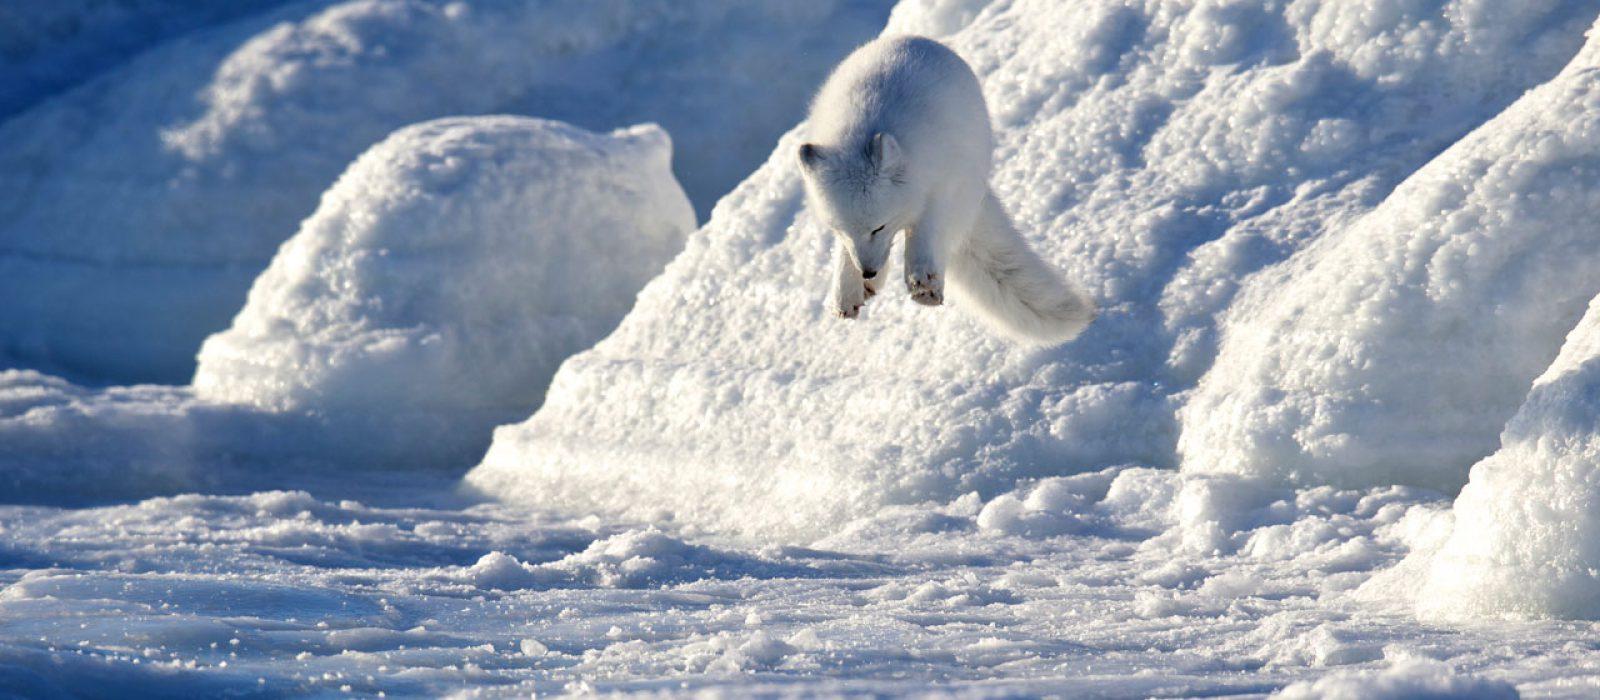 Leaping fox at Churchill Wild, Manitoba